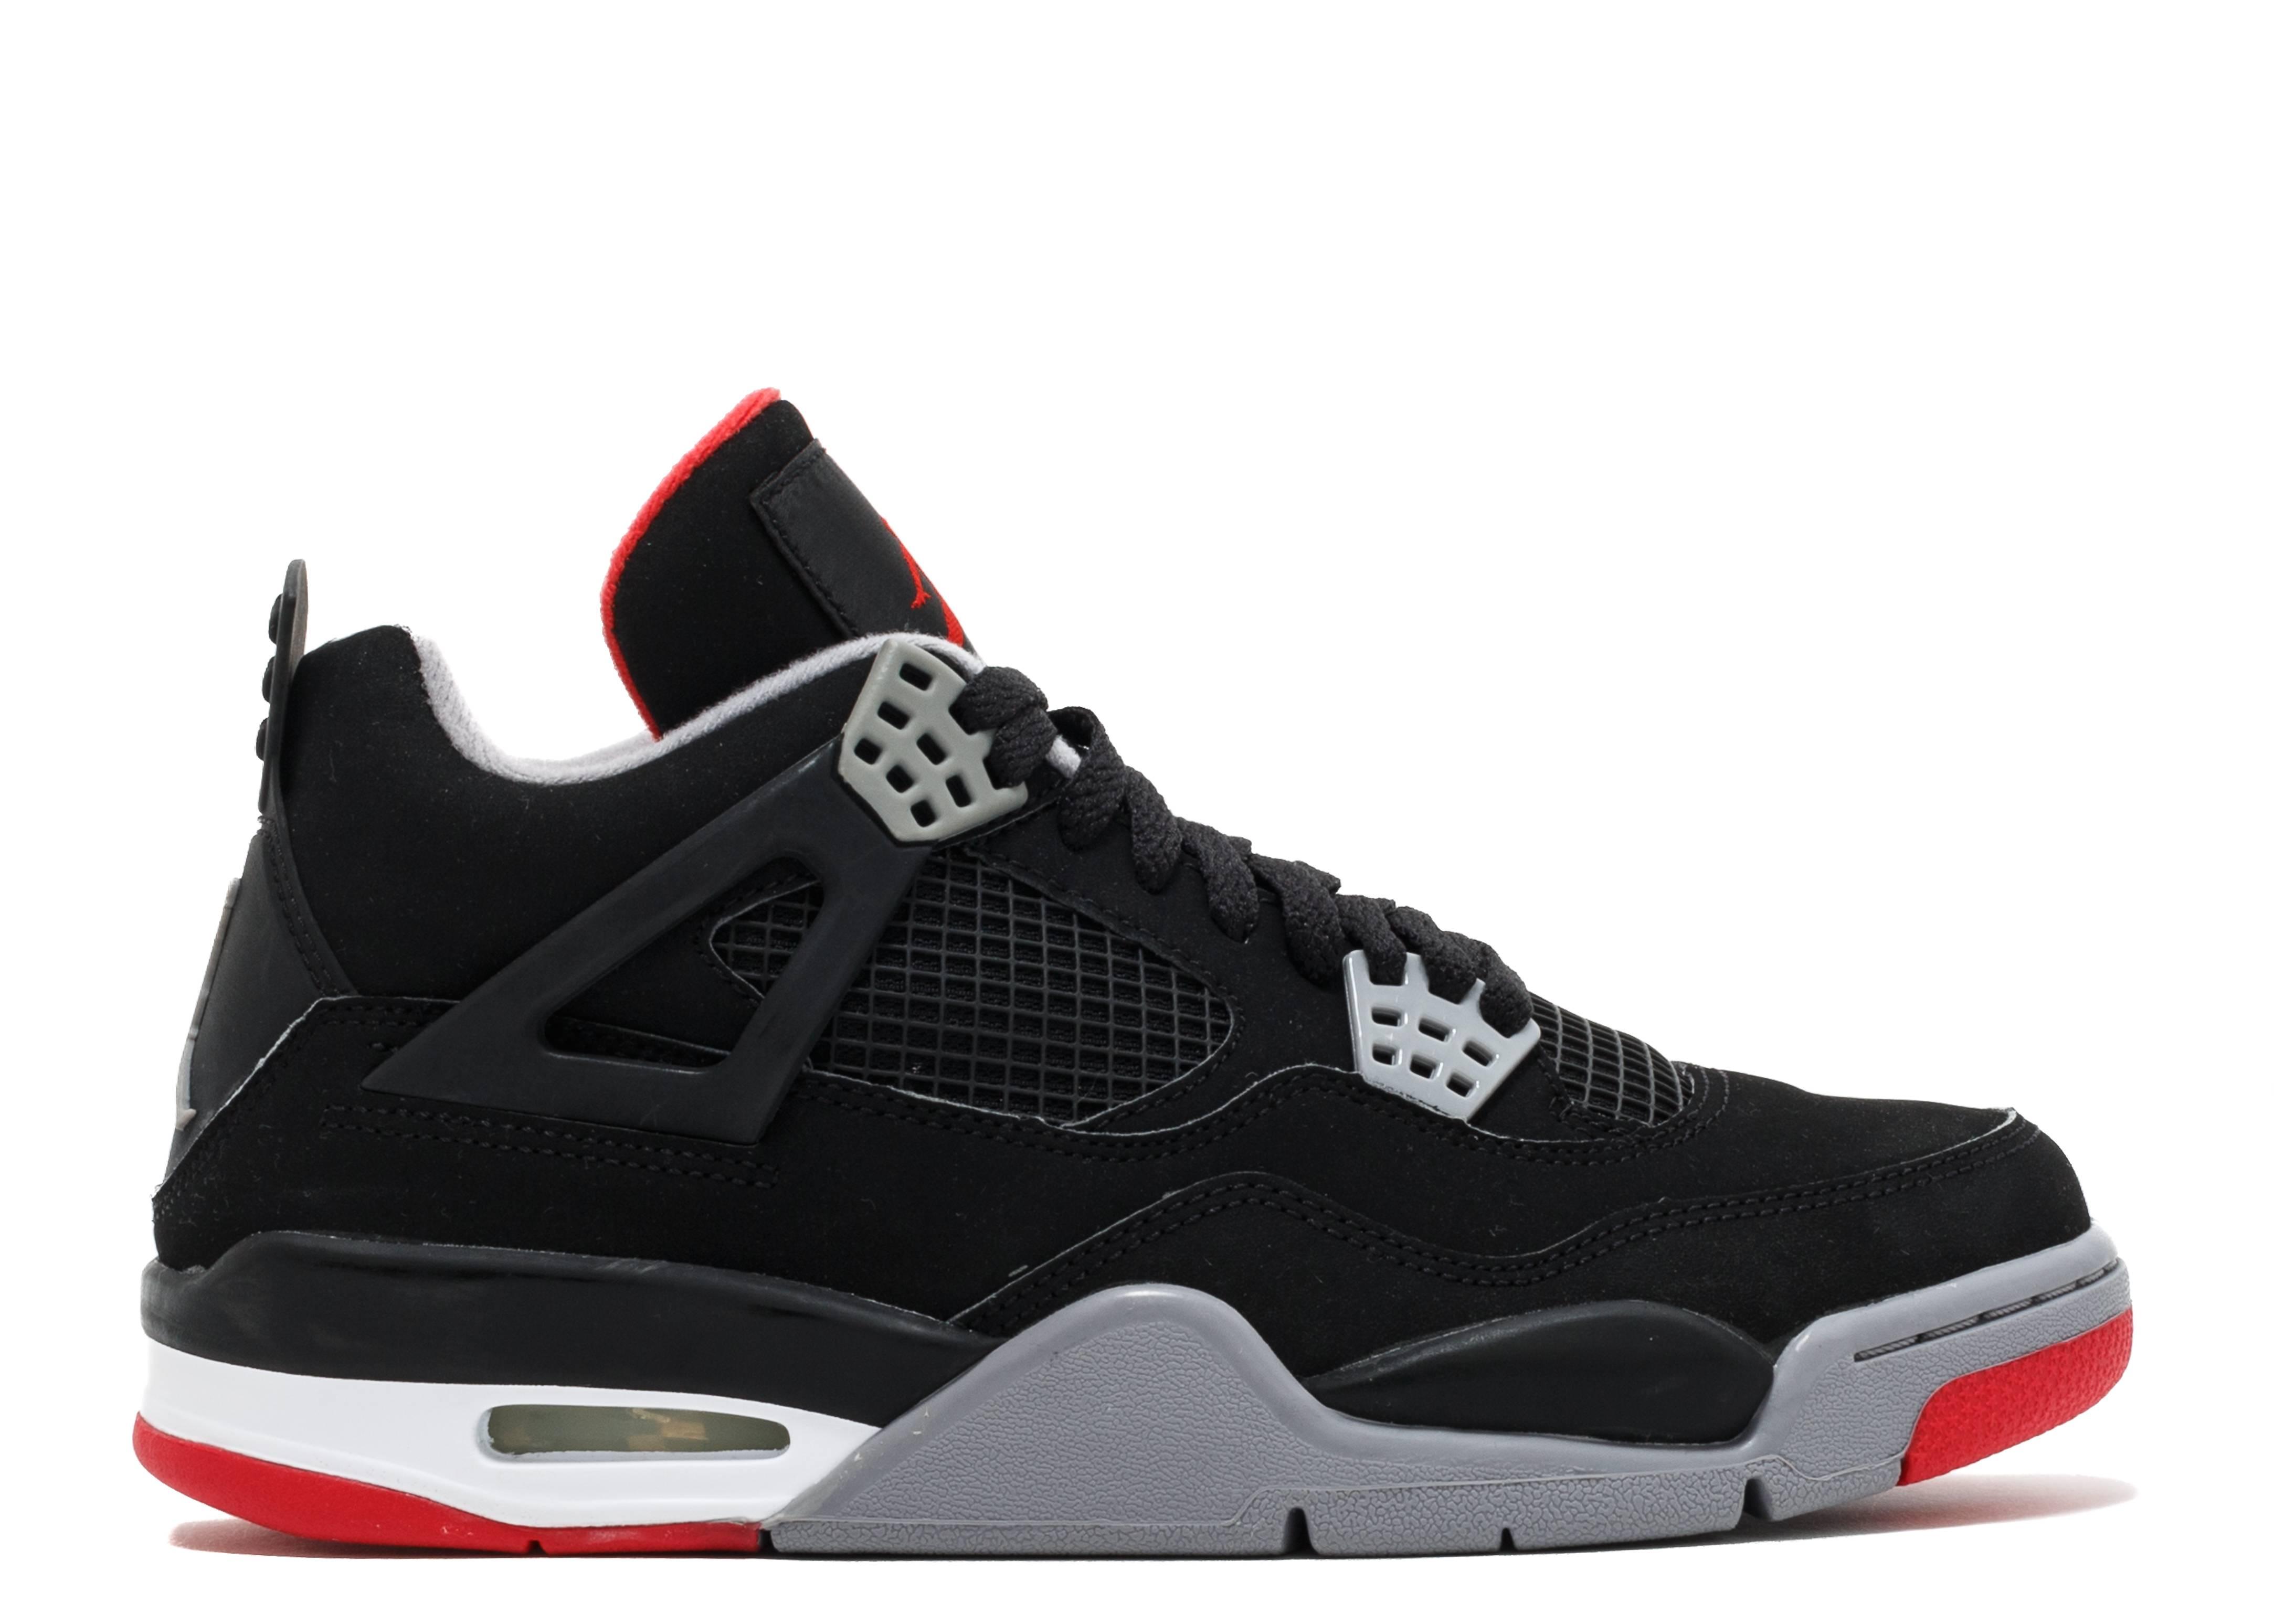 Air Jordan 4 Élevé Prix 2012